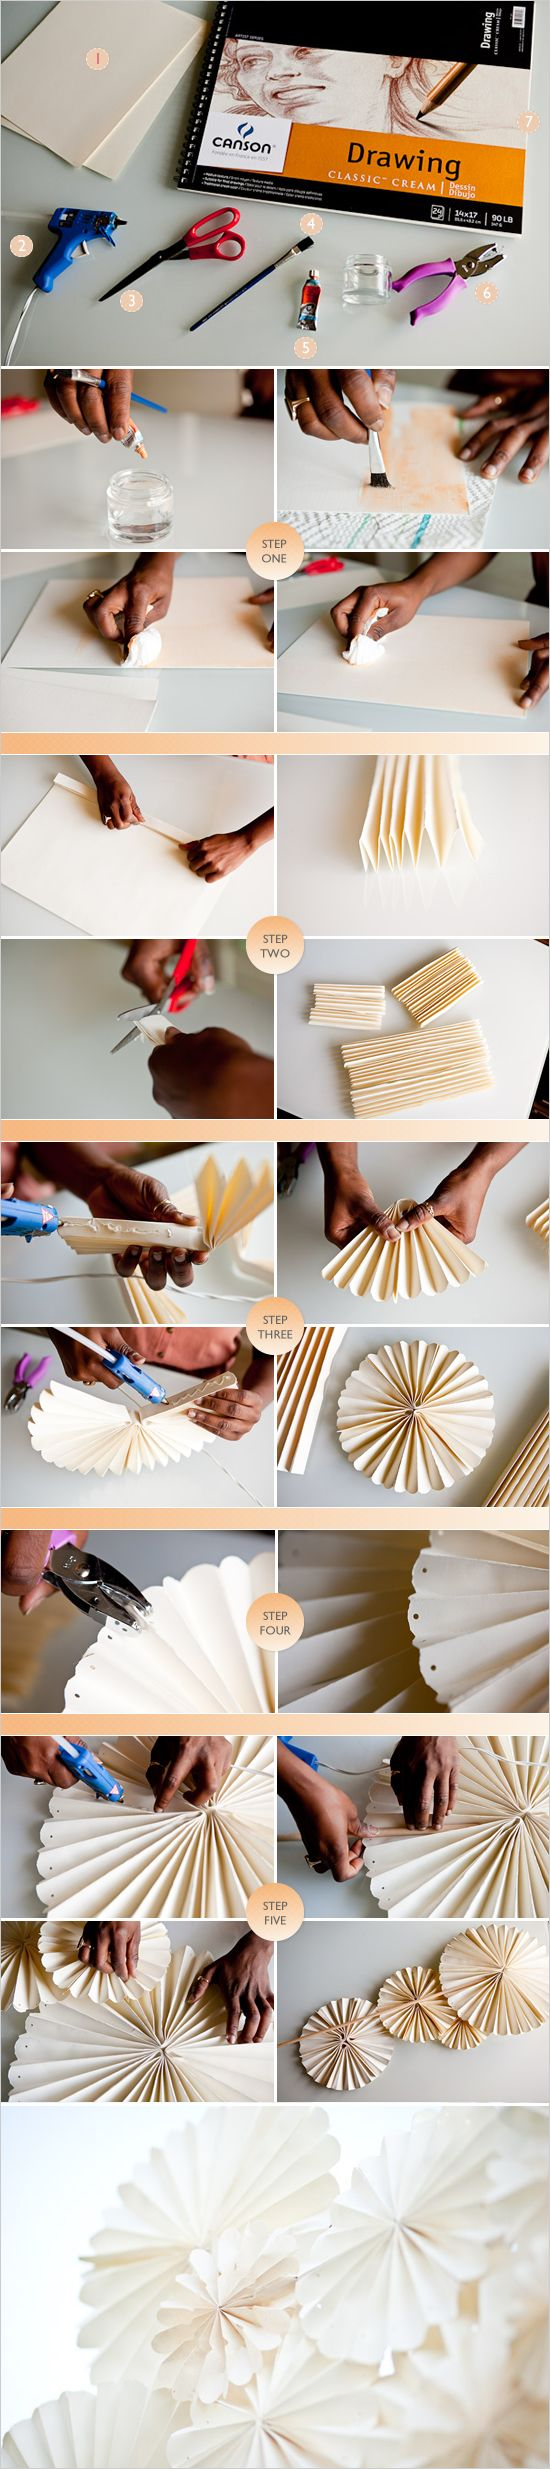 diy pinwheels how to